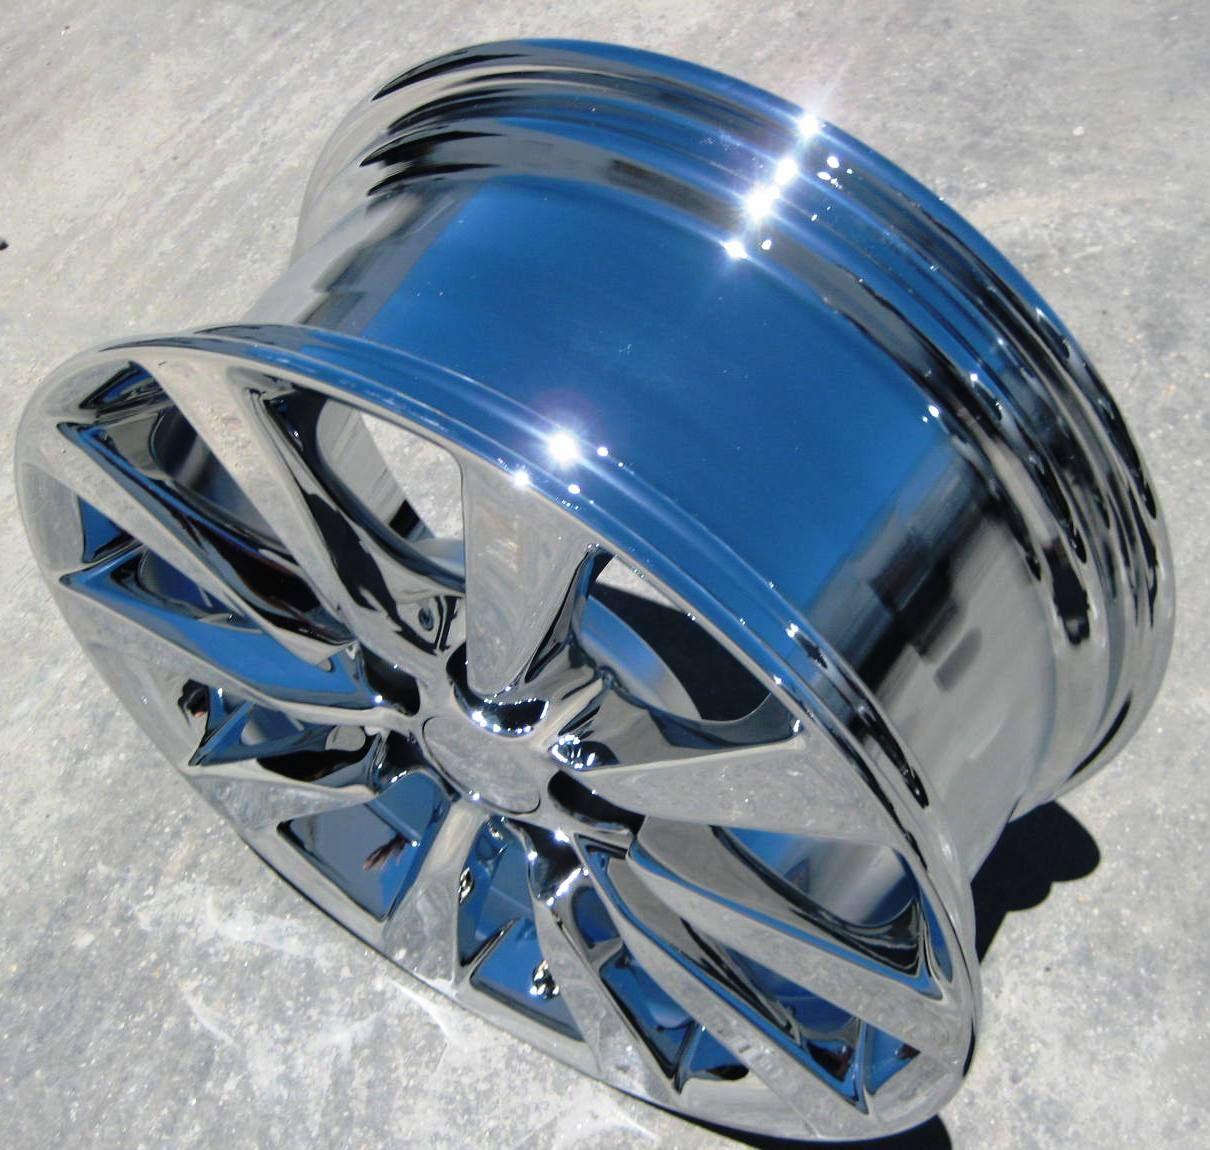 Stock 18 Factory Lexus LS460 LS600 Chrome Wheels Rims 2010 13